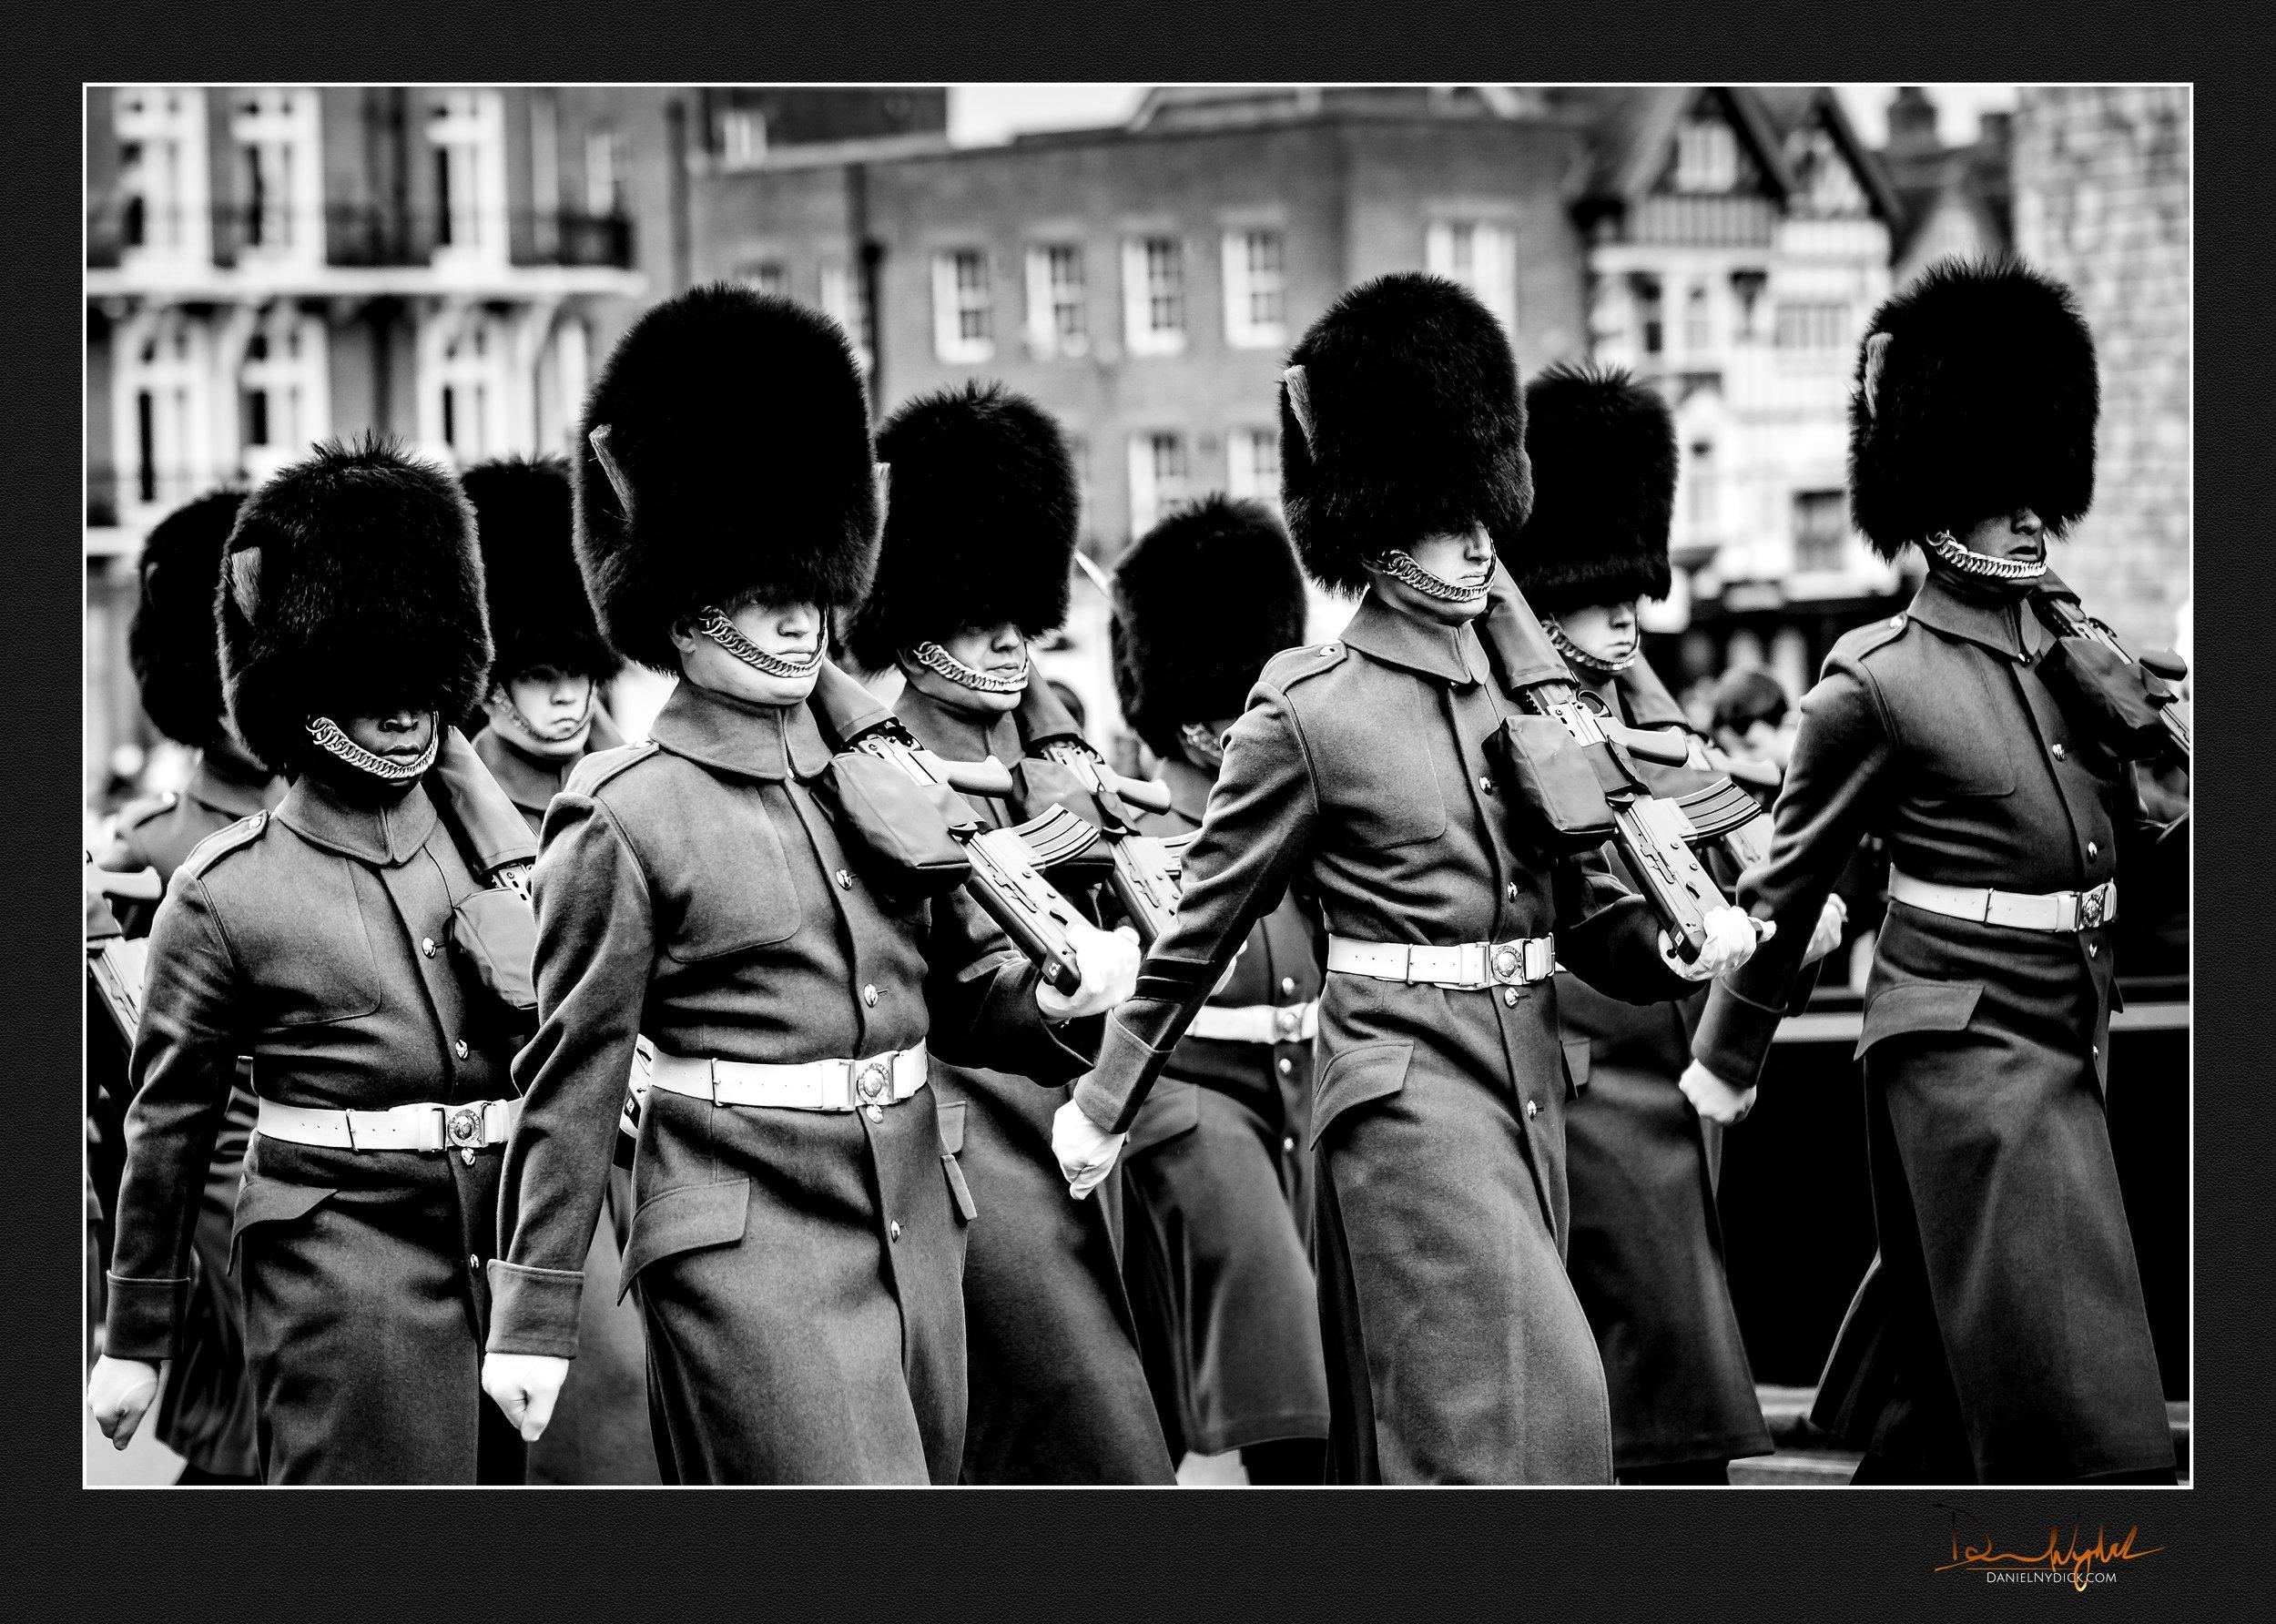 windsor gurads marching, rifle